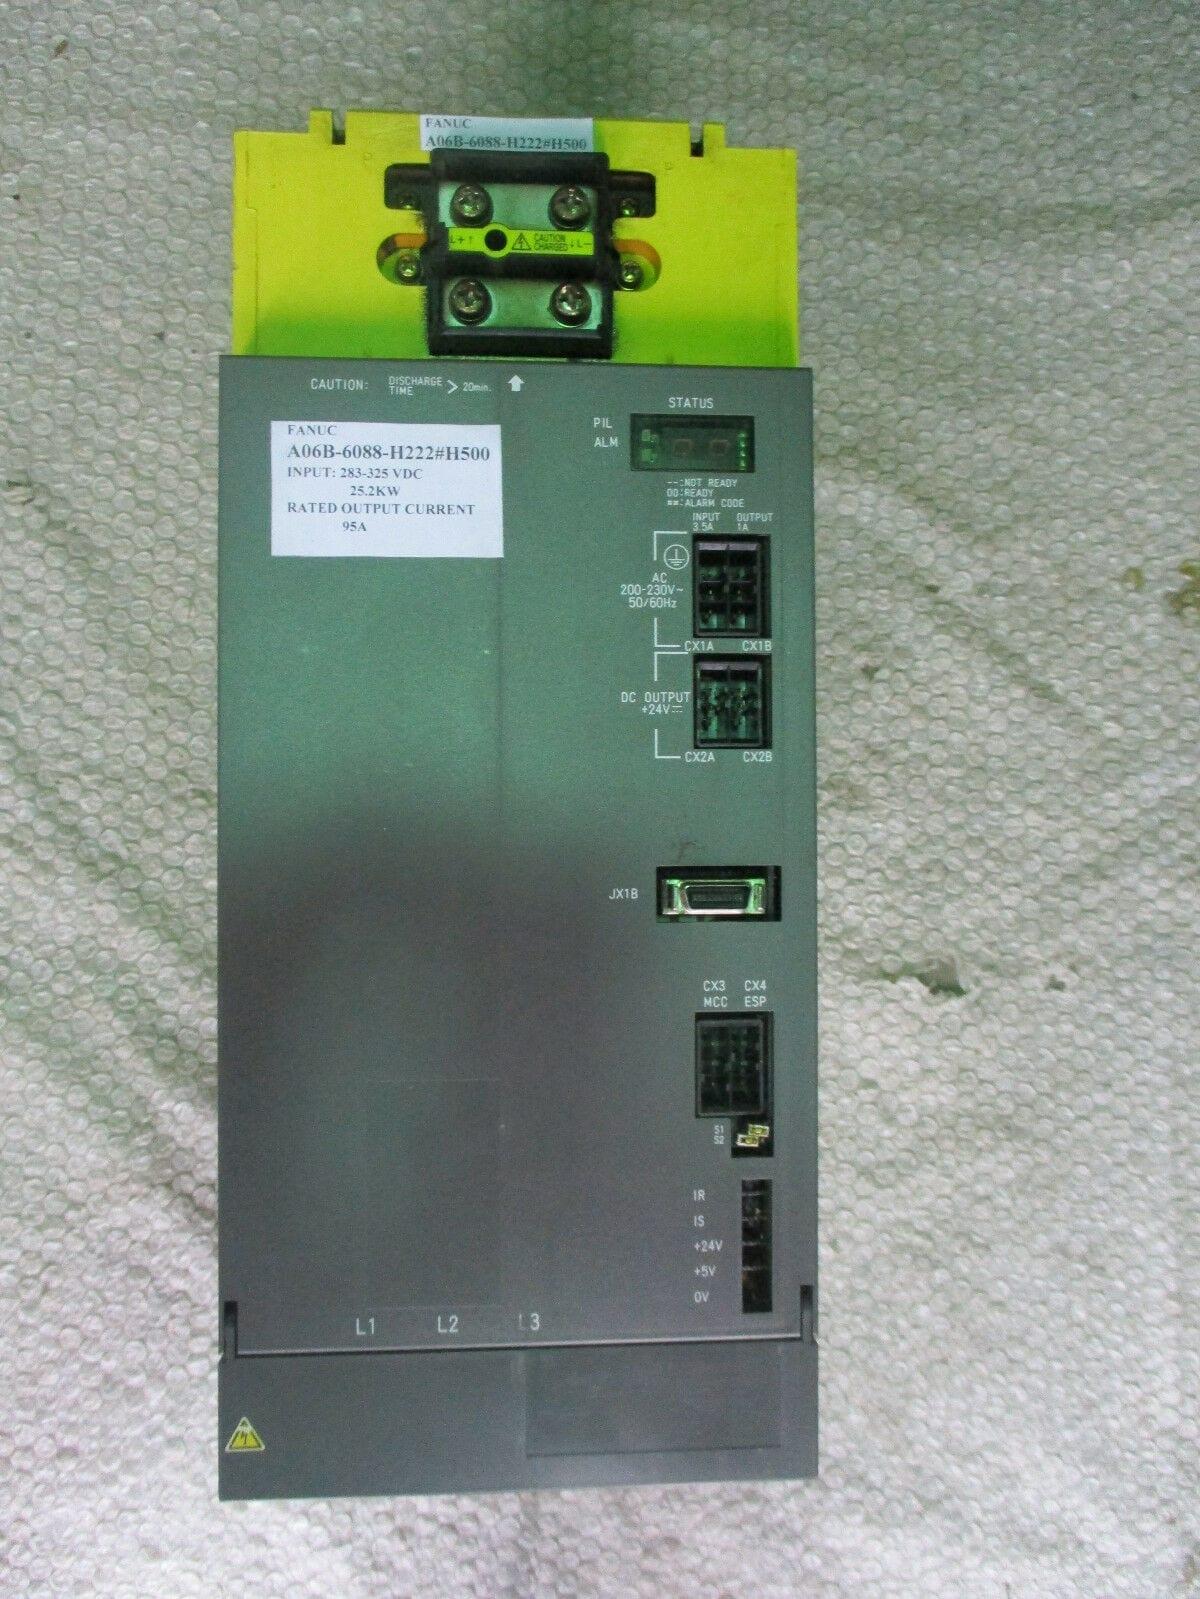 Fanuc A06B-6088-H222#H500 Power Supply Module A06B-6088-H222 25 2kW 95A  *Tested*